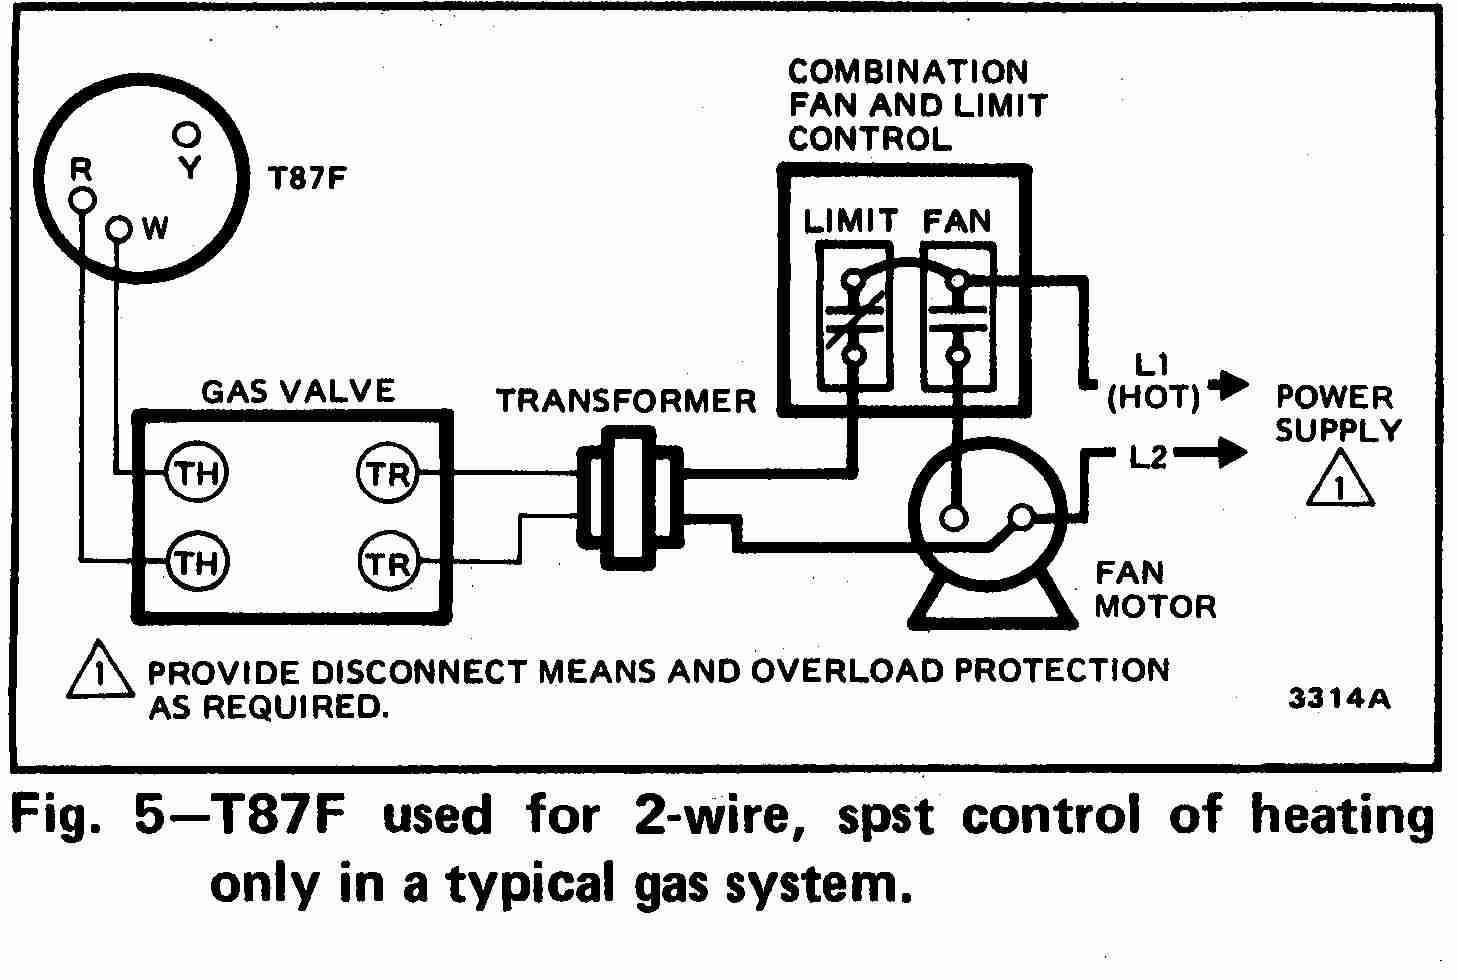 White Rodgers Gas Valve Wiring Diagram | Wiring Diagram - White Rodgers Gas Valve Wiring Diagram